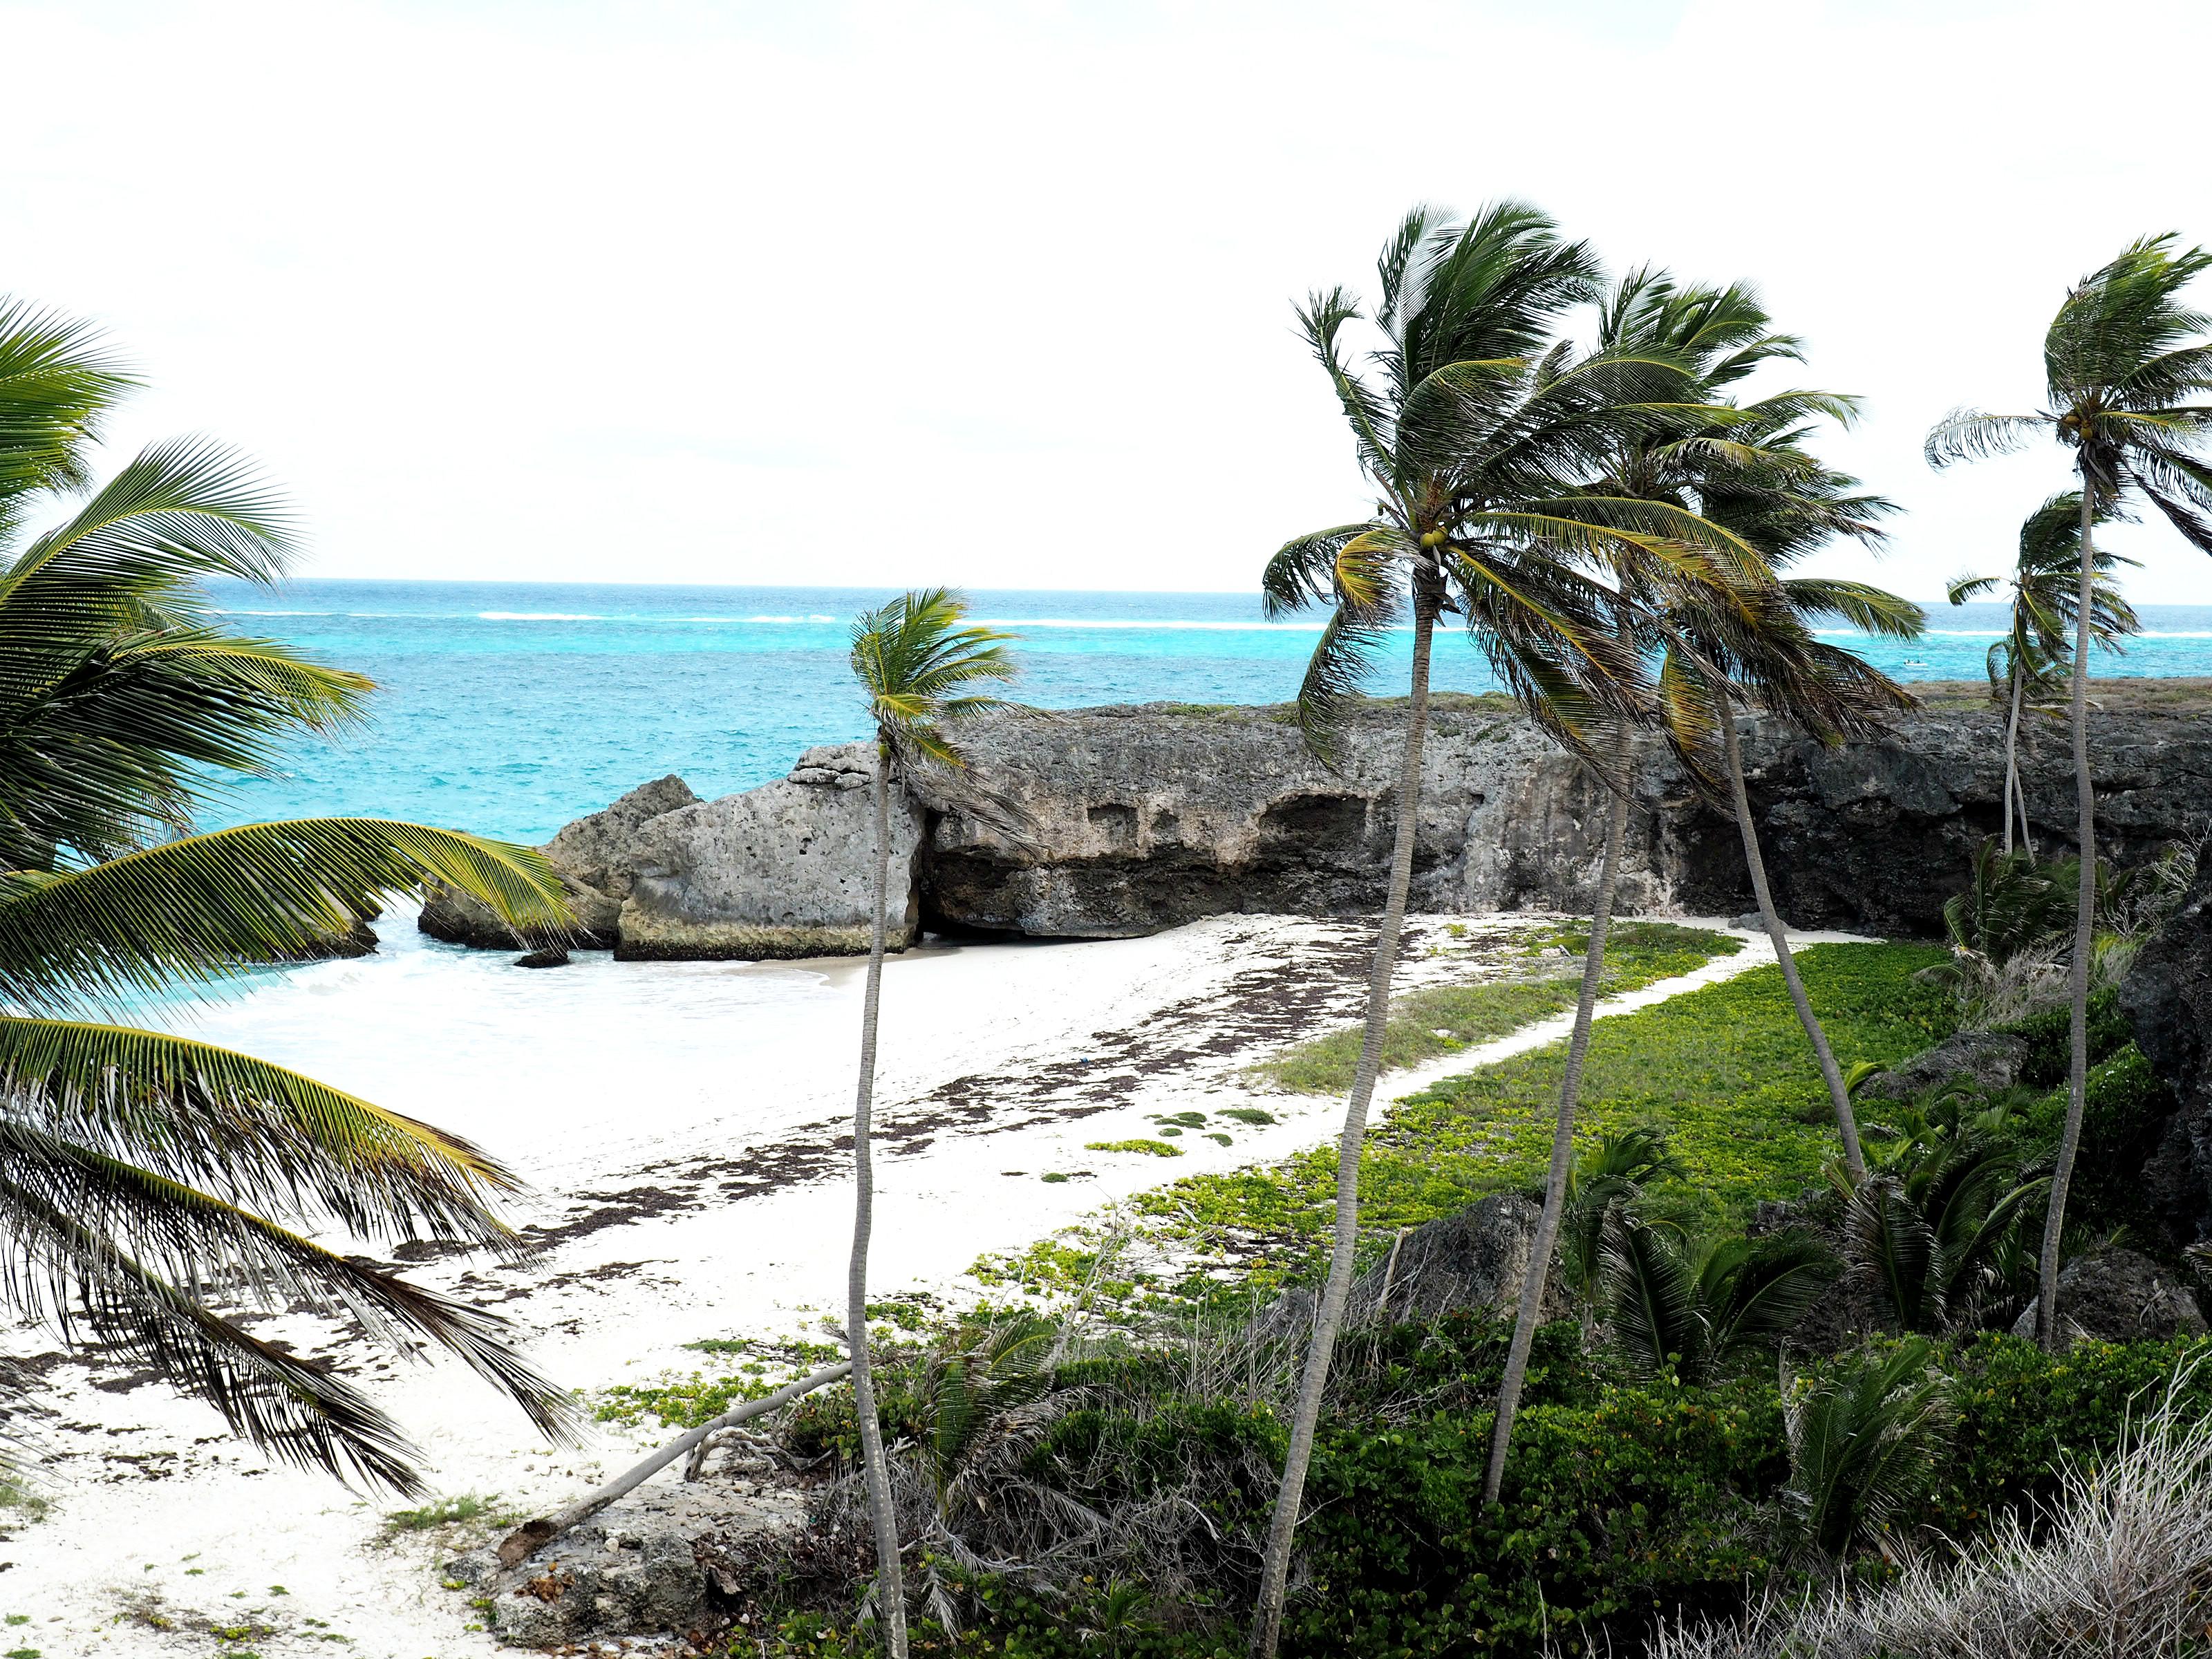 Tommeezjerry-Männerblog-Berlinblog-Fashionblog-Styleblog-Travelblog-Travel-Reiseblog-Reisen-Barbados-Karibik-Carribean-Summer-Sommer-Vacation-14